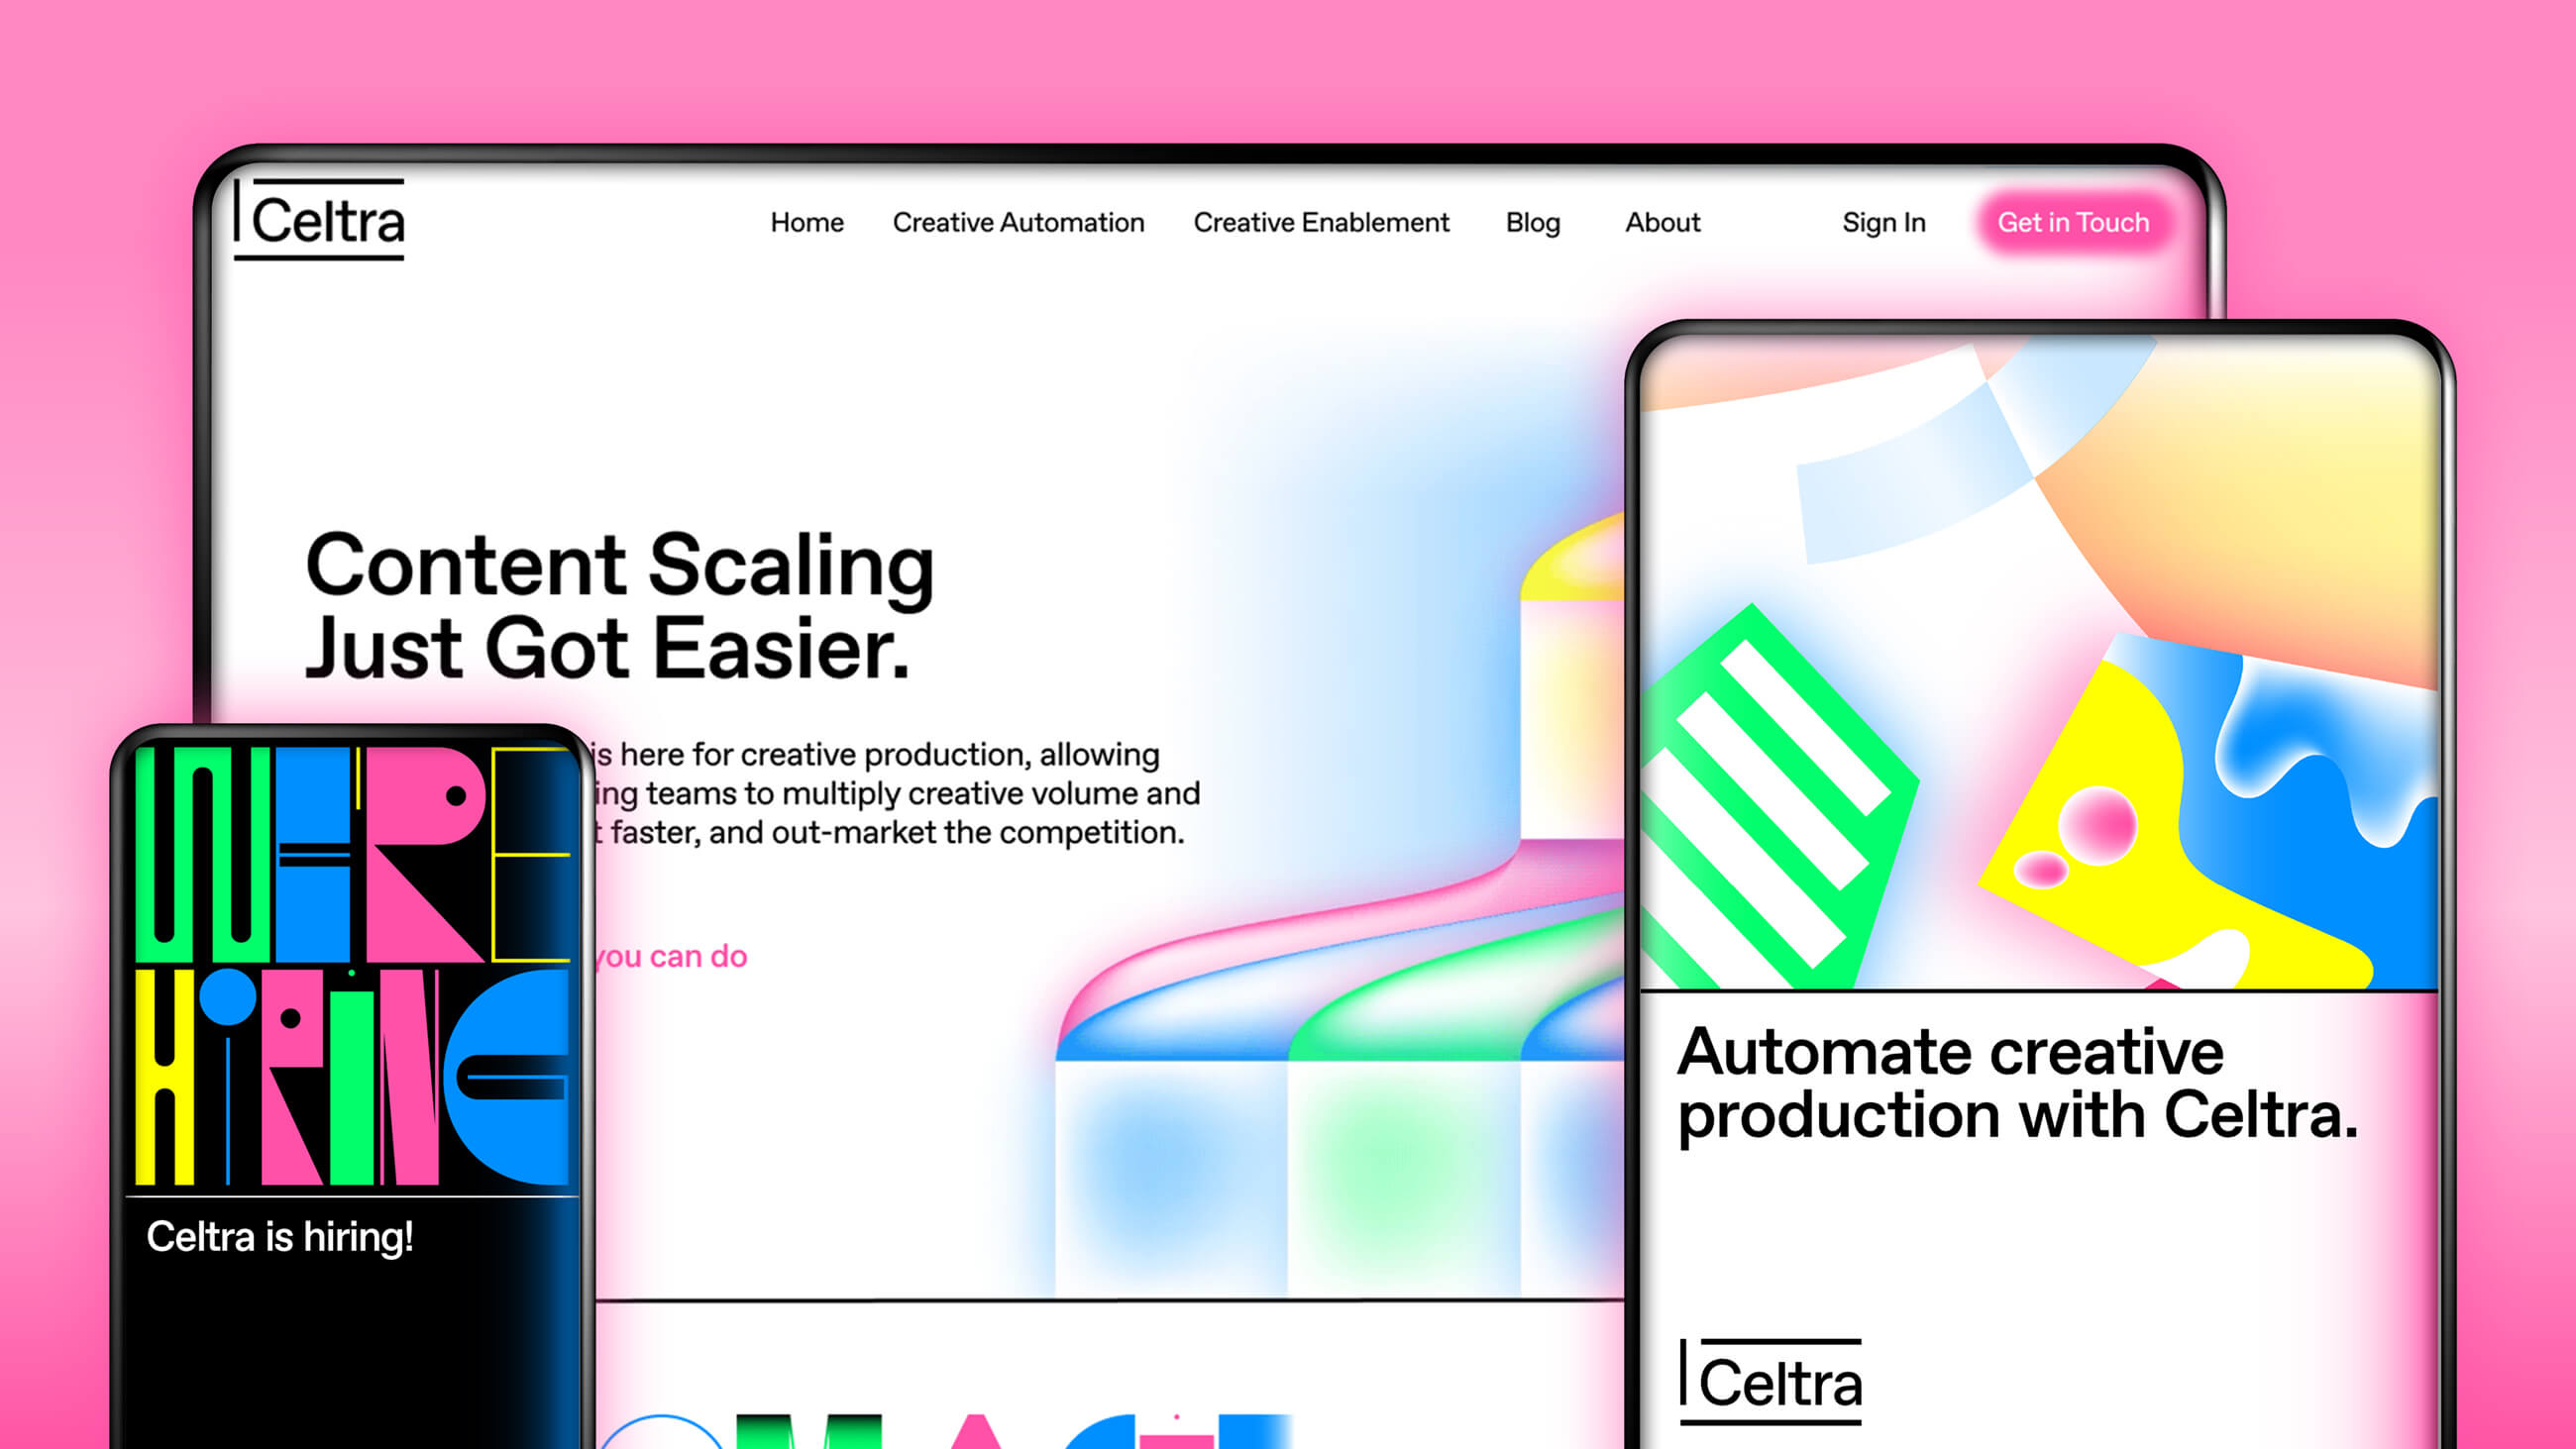 Celtra digital design on various devices.